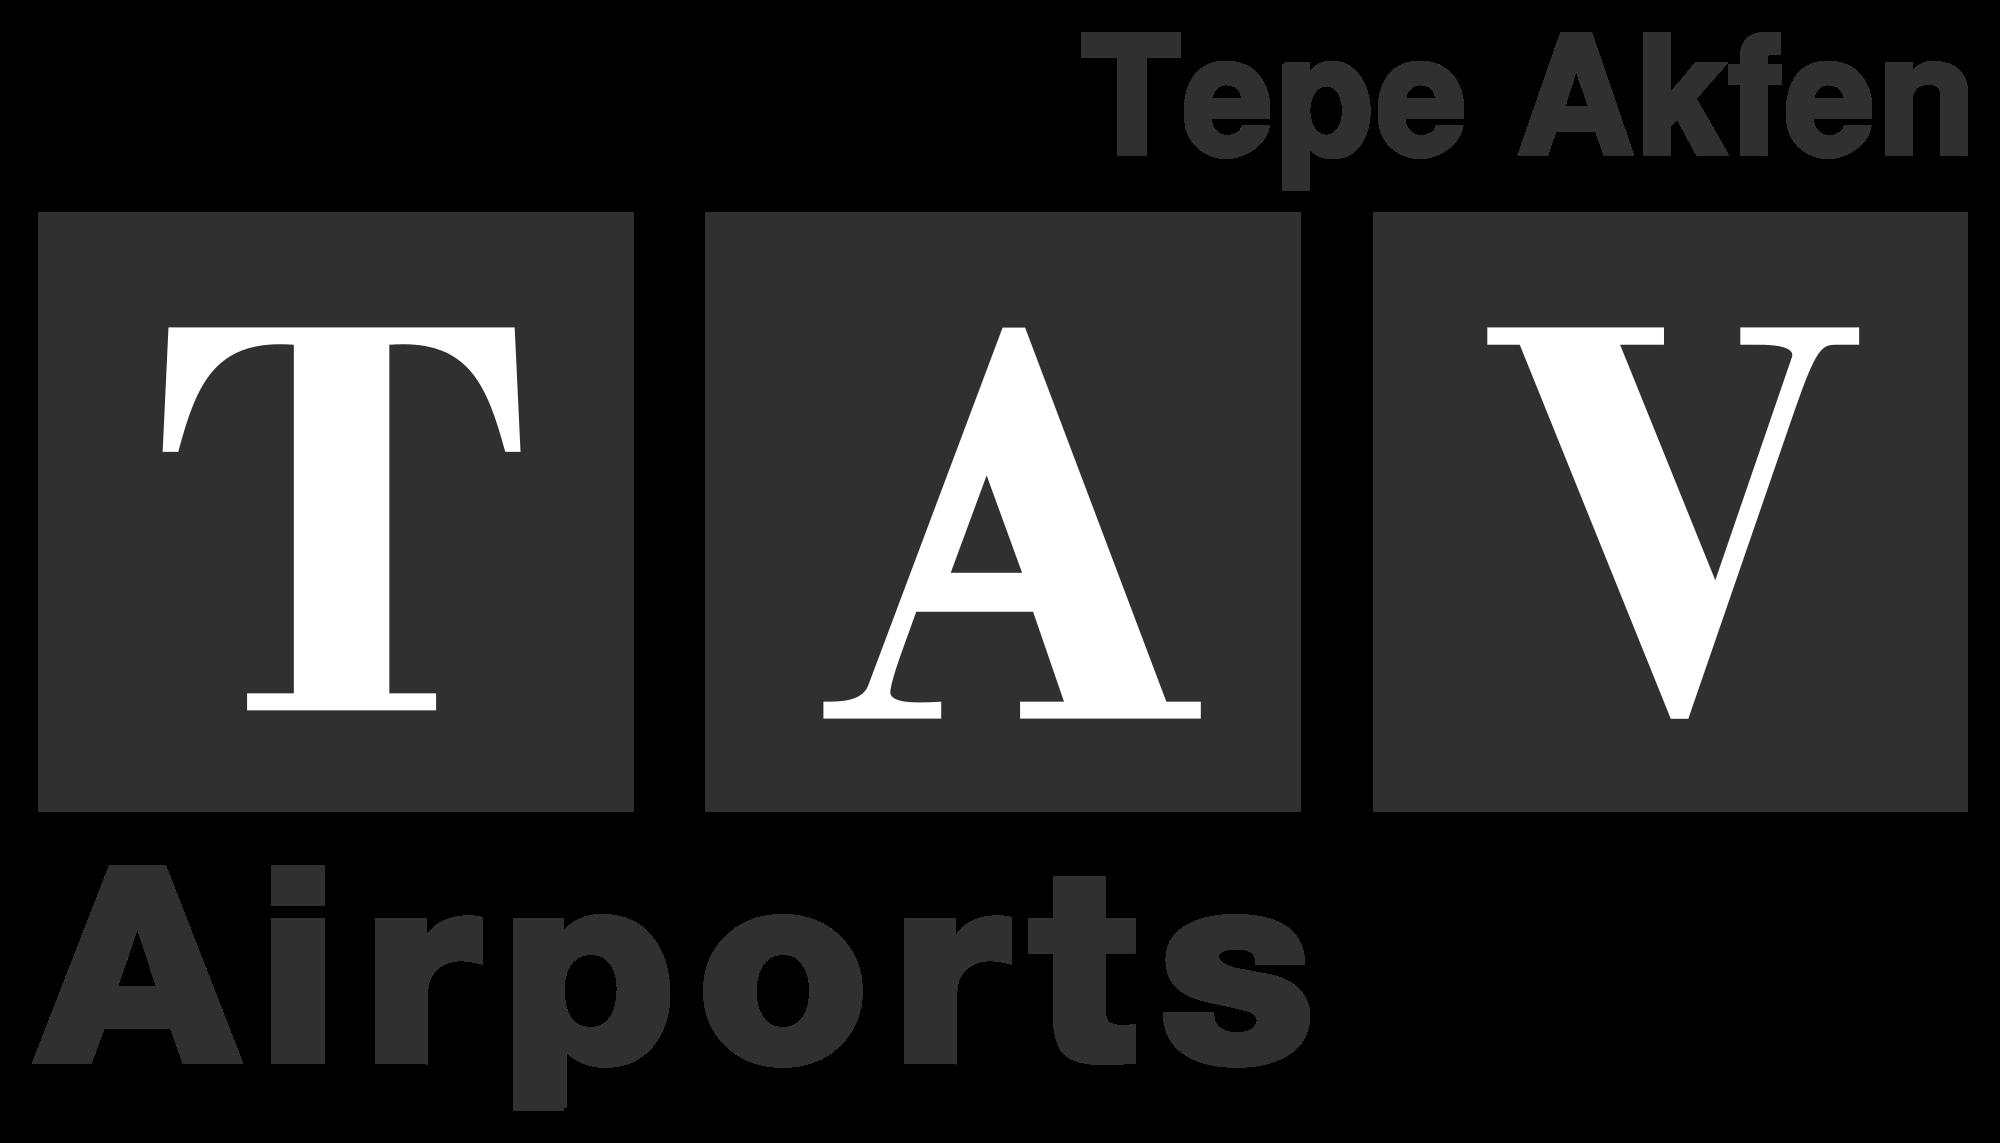 TAV_Airports_logo.svg-ConvertImage